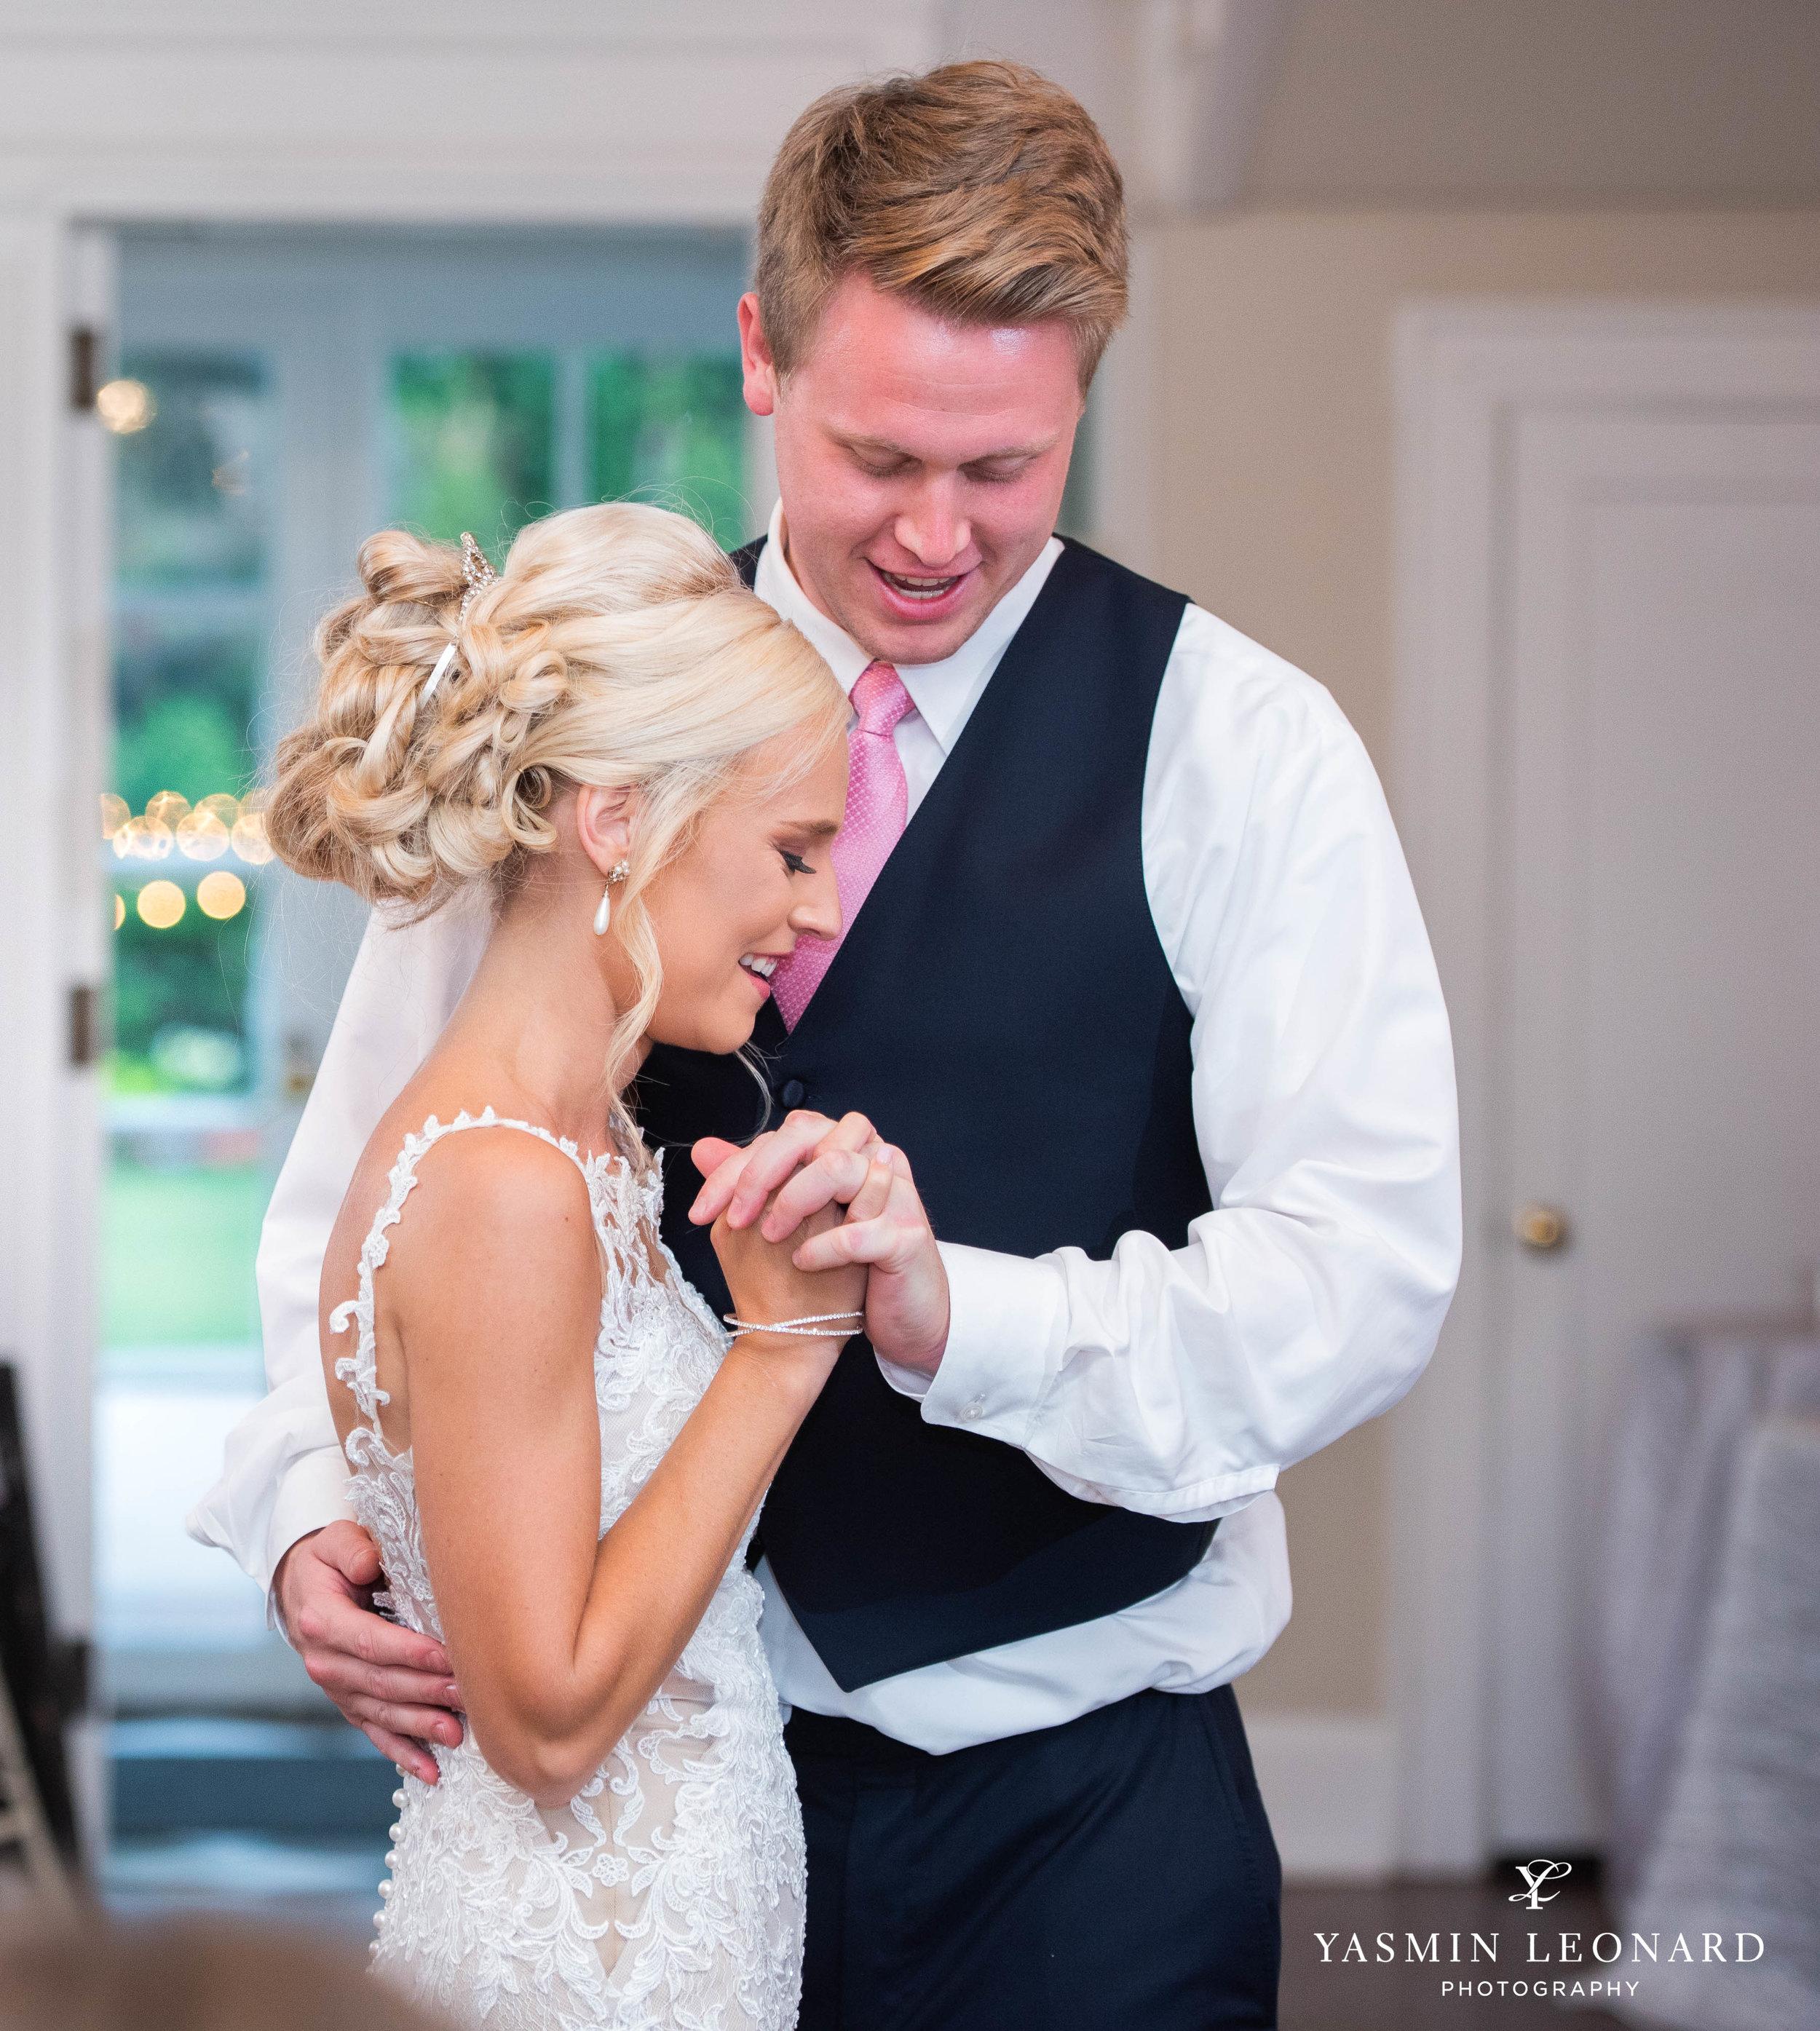 Separk Mansion - NC Weddings - Gastonia Wedding - NC Wedding Venues - Pink and Blue Wedding Ideas - Pink Bridesmaid Dresses - Yasmin Leonard Photography-50.jpg